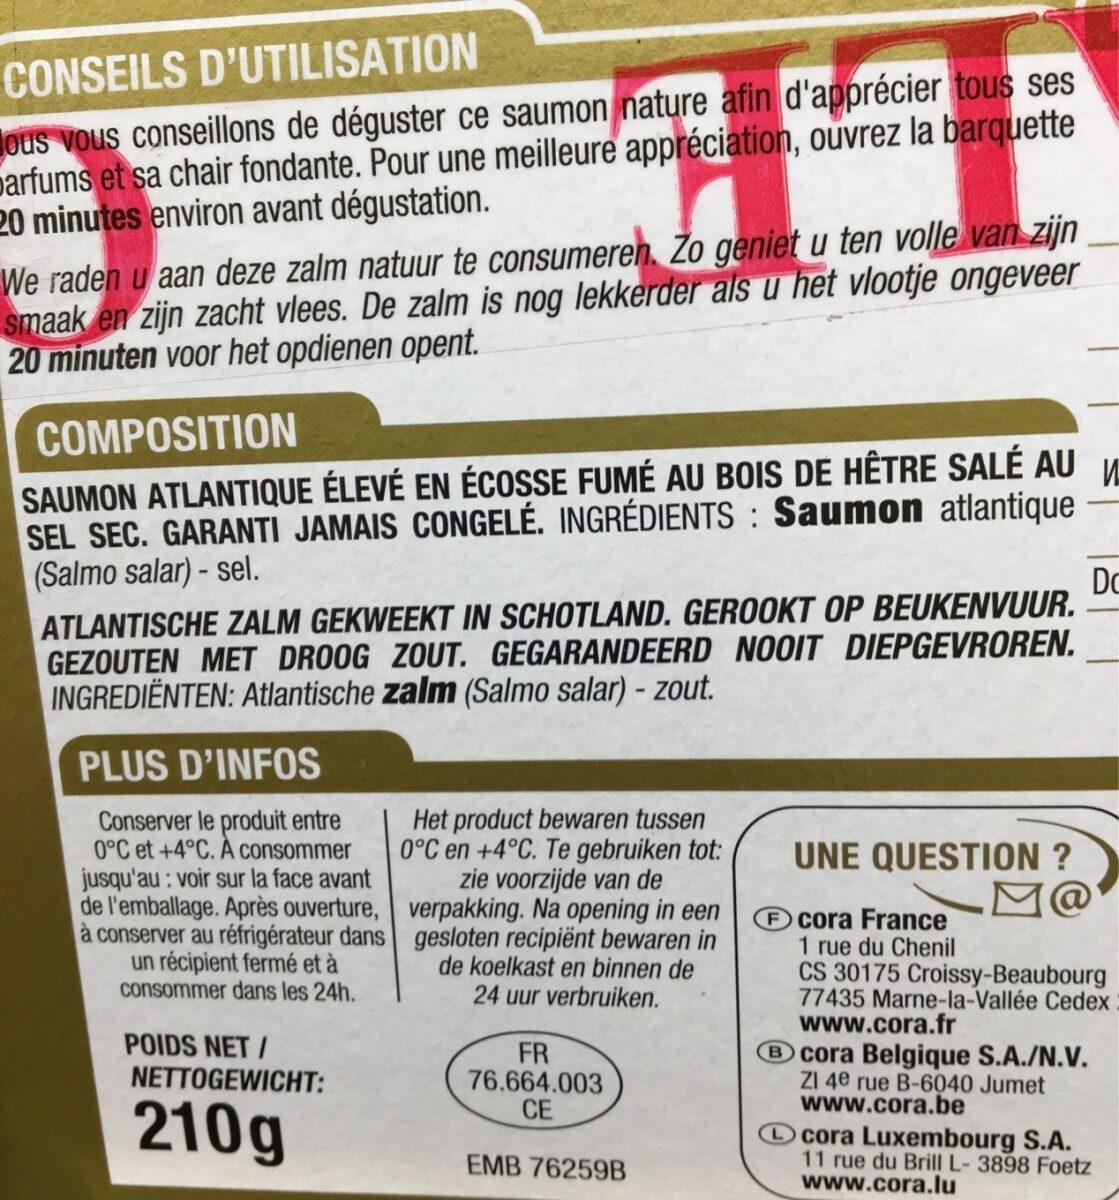 Saumon fume ecosse - Ingredients - fr